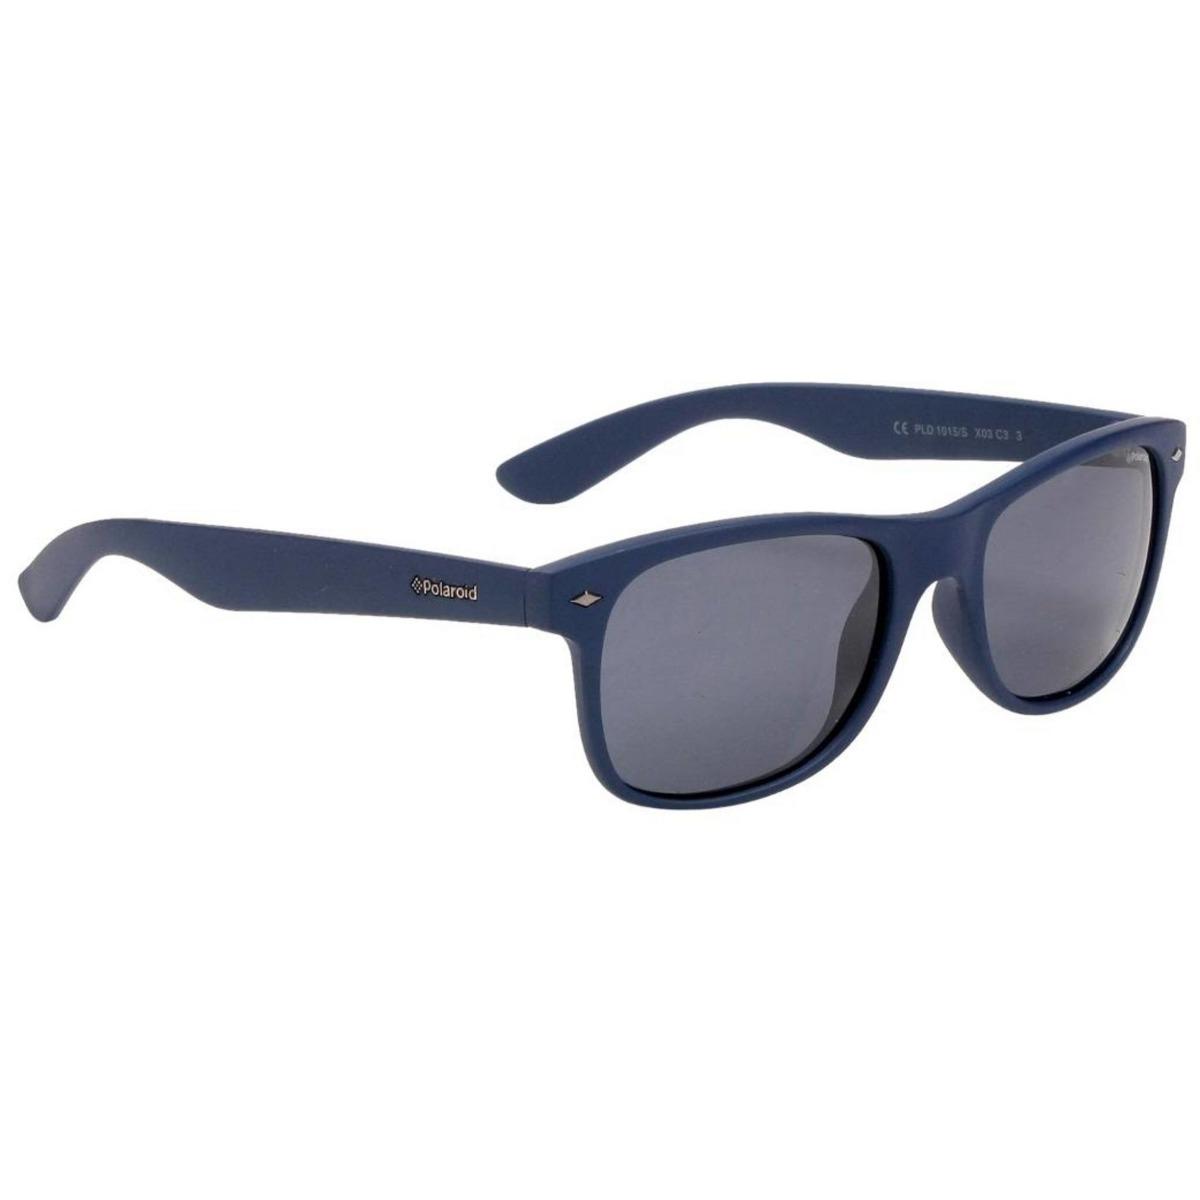 Óculos De Sol Polaroid Masculino Pld1015 s X03c3 - R  159,00 em ... 82a654ead3